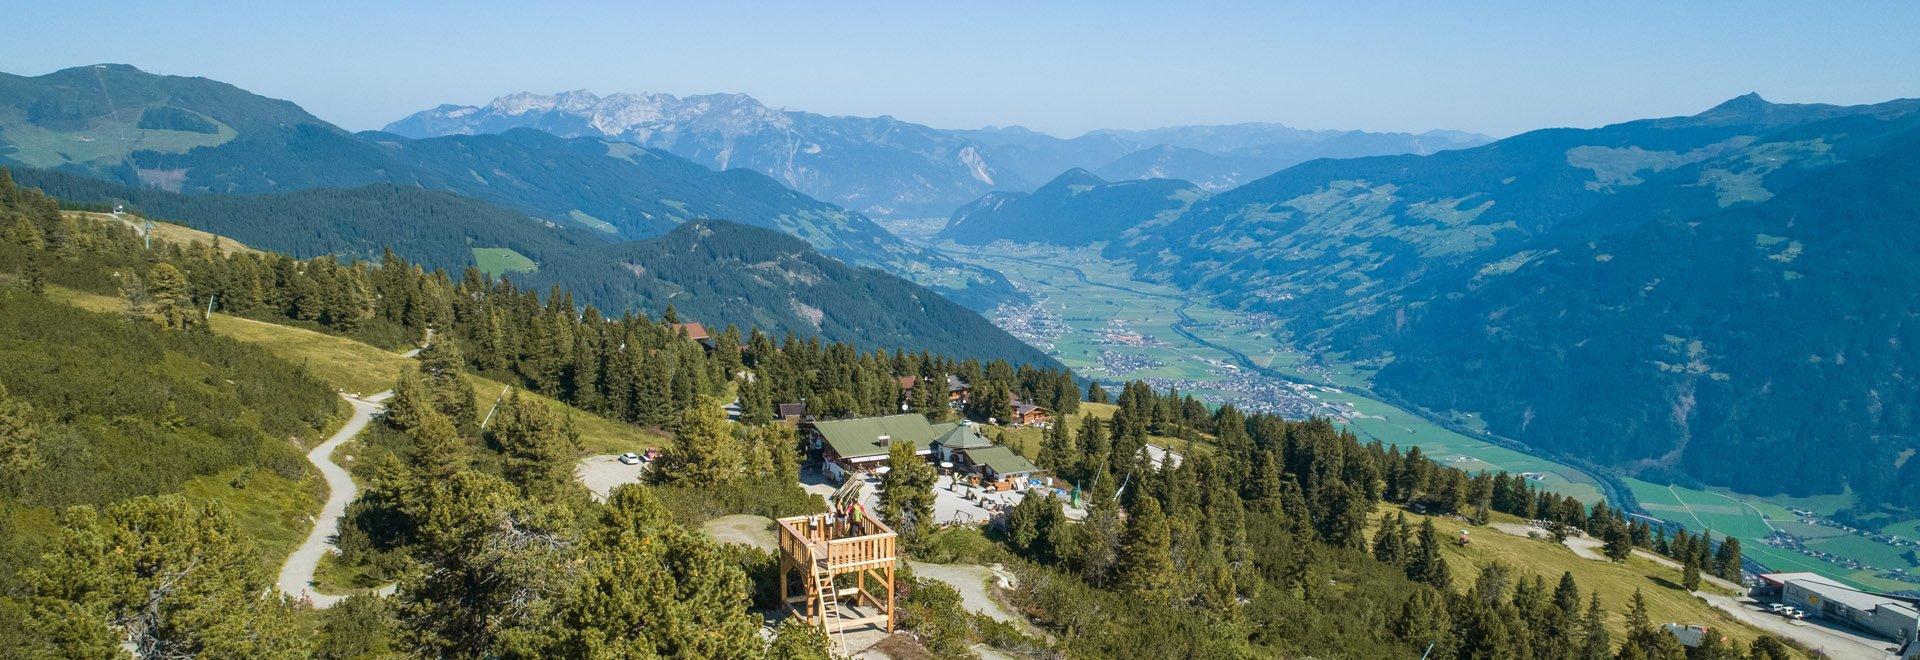 Panorama Hubertus Wildtierpfad